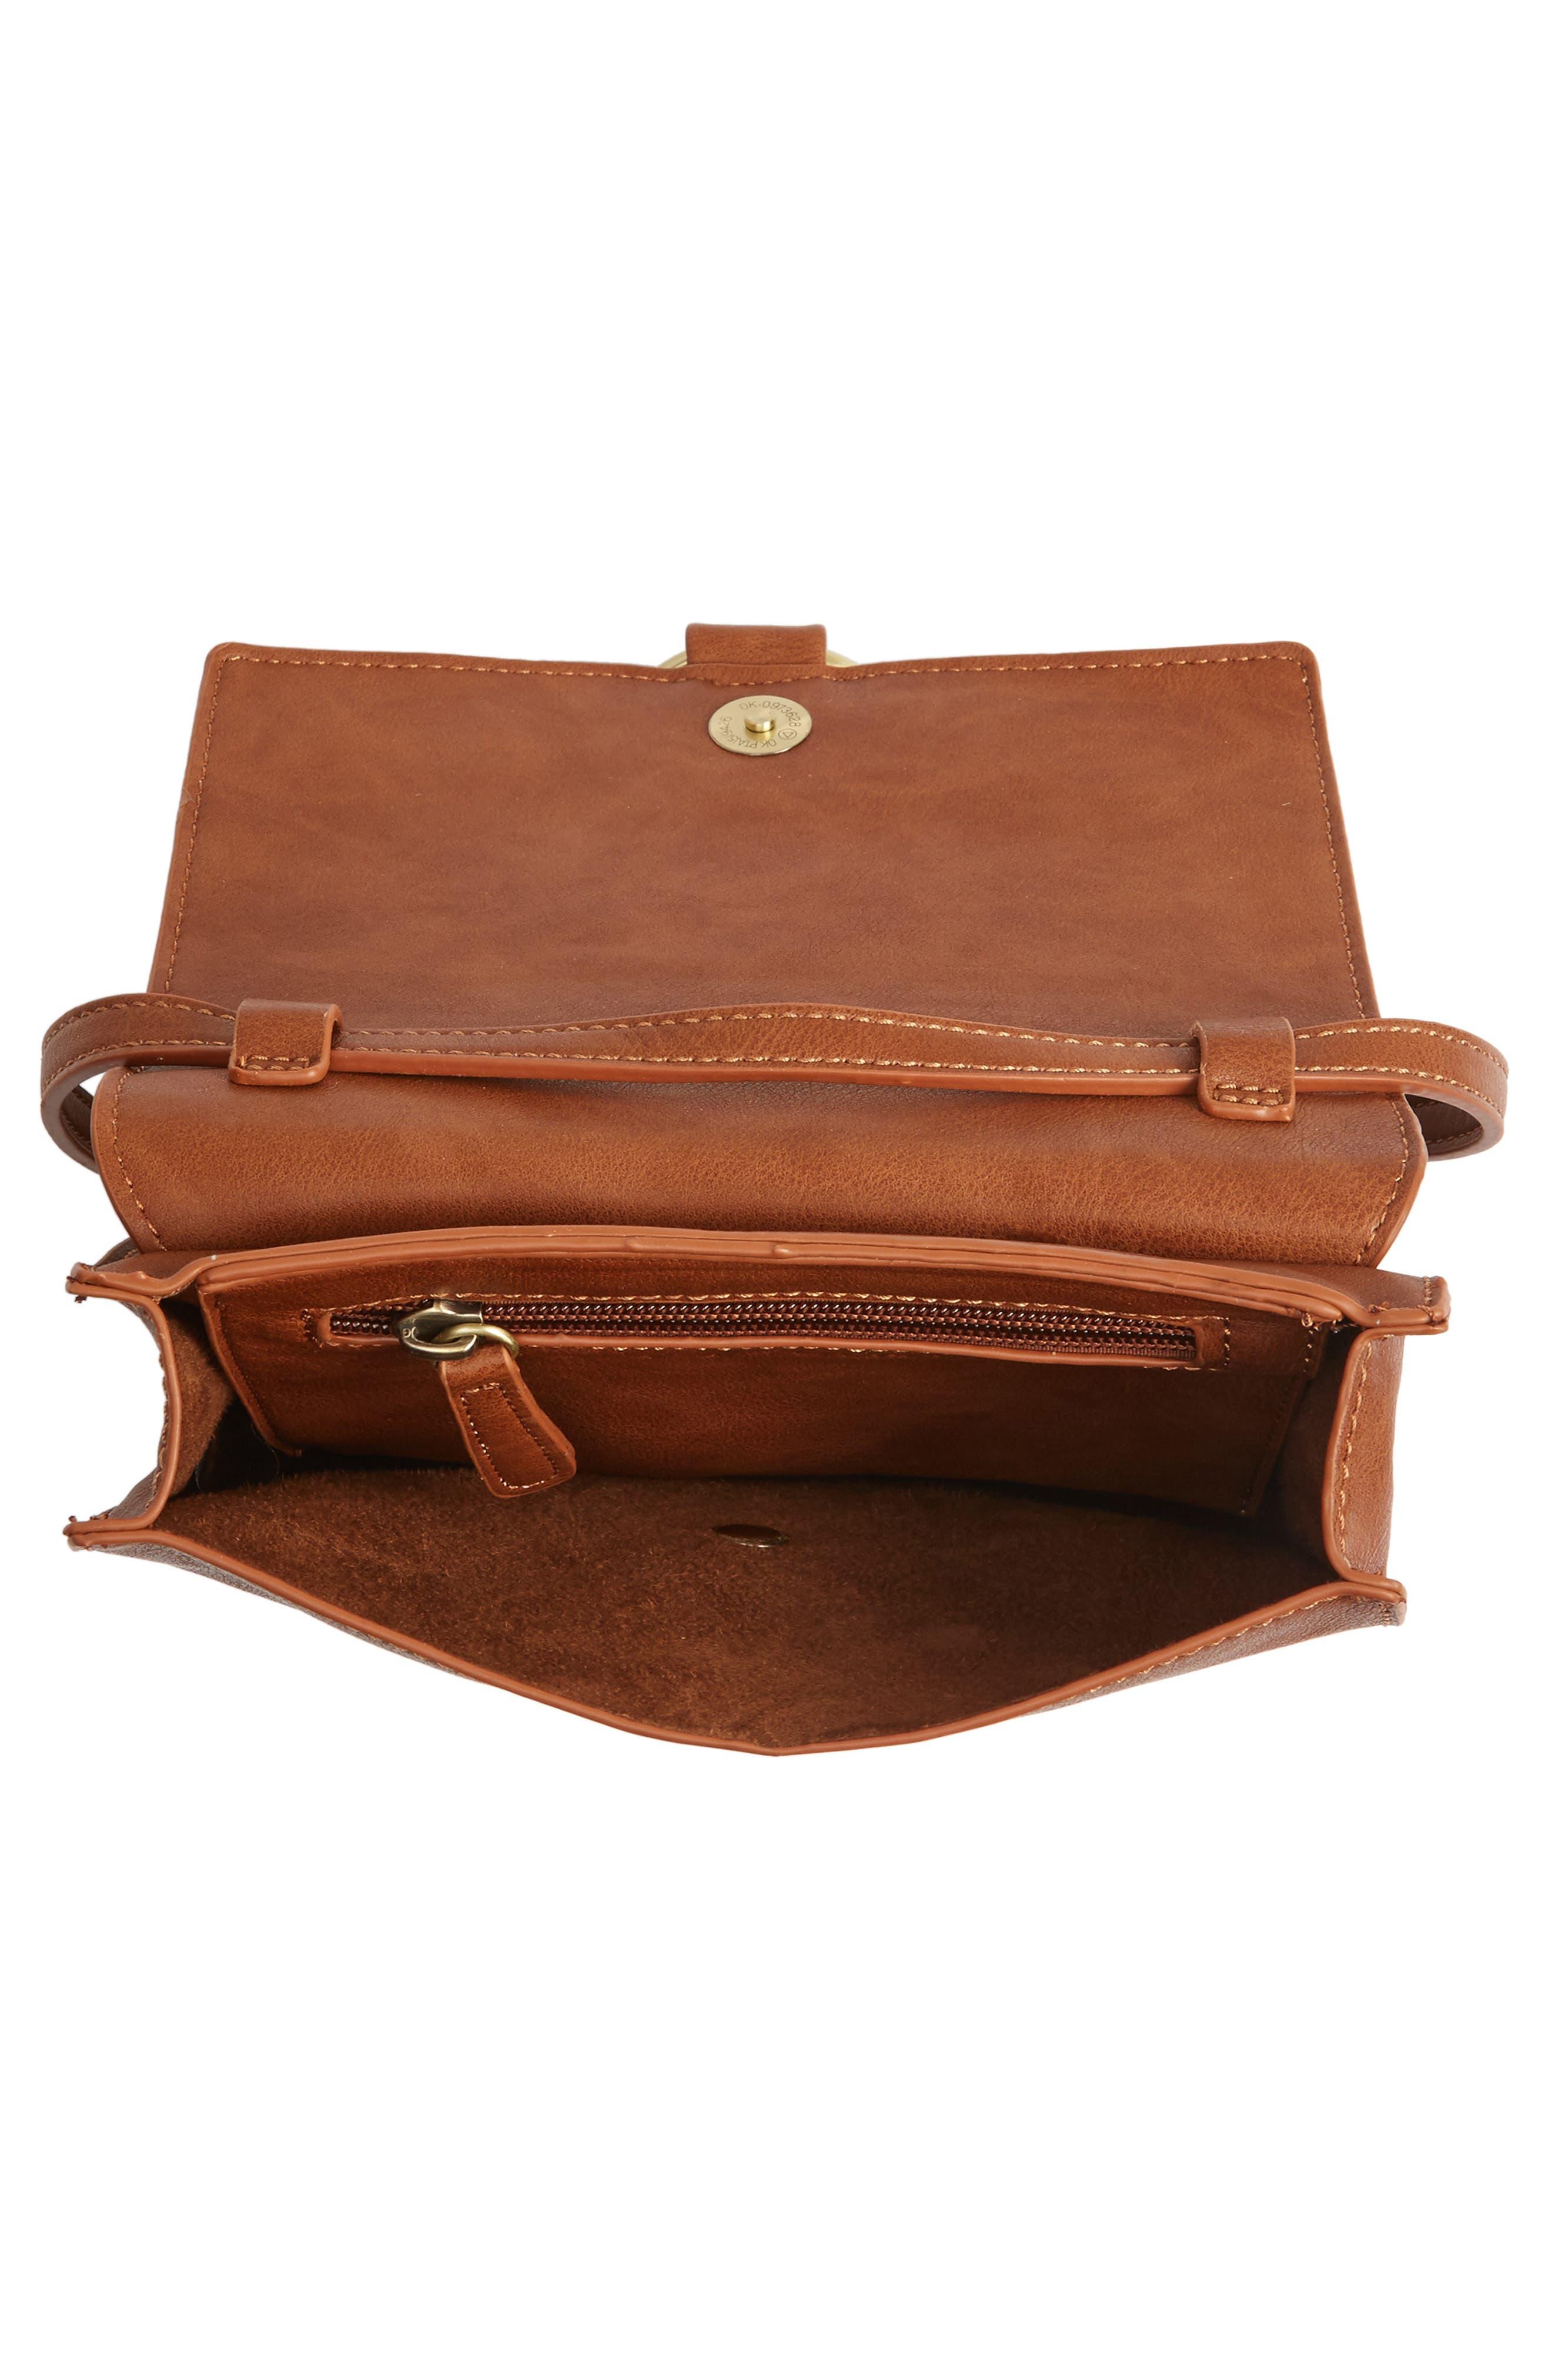 Square Crossbody Bag,                             Alternate thumbnail 5, color,                             Cognac